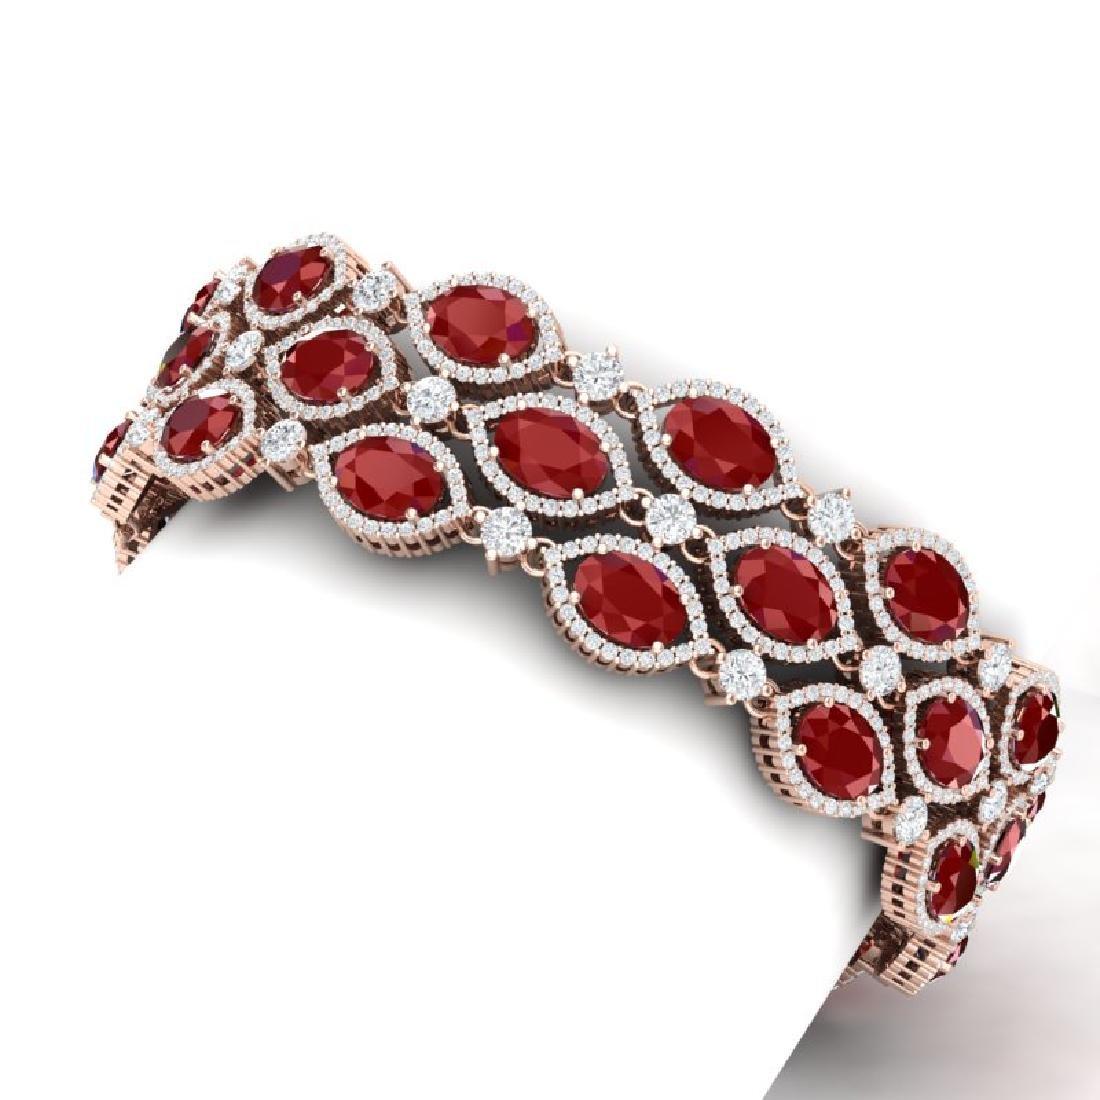 47.84 CTW Royalty Ruby & VS Diamond Bracelet 18K Rose - 2